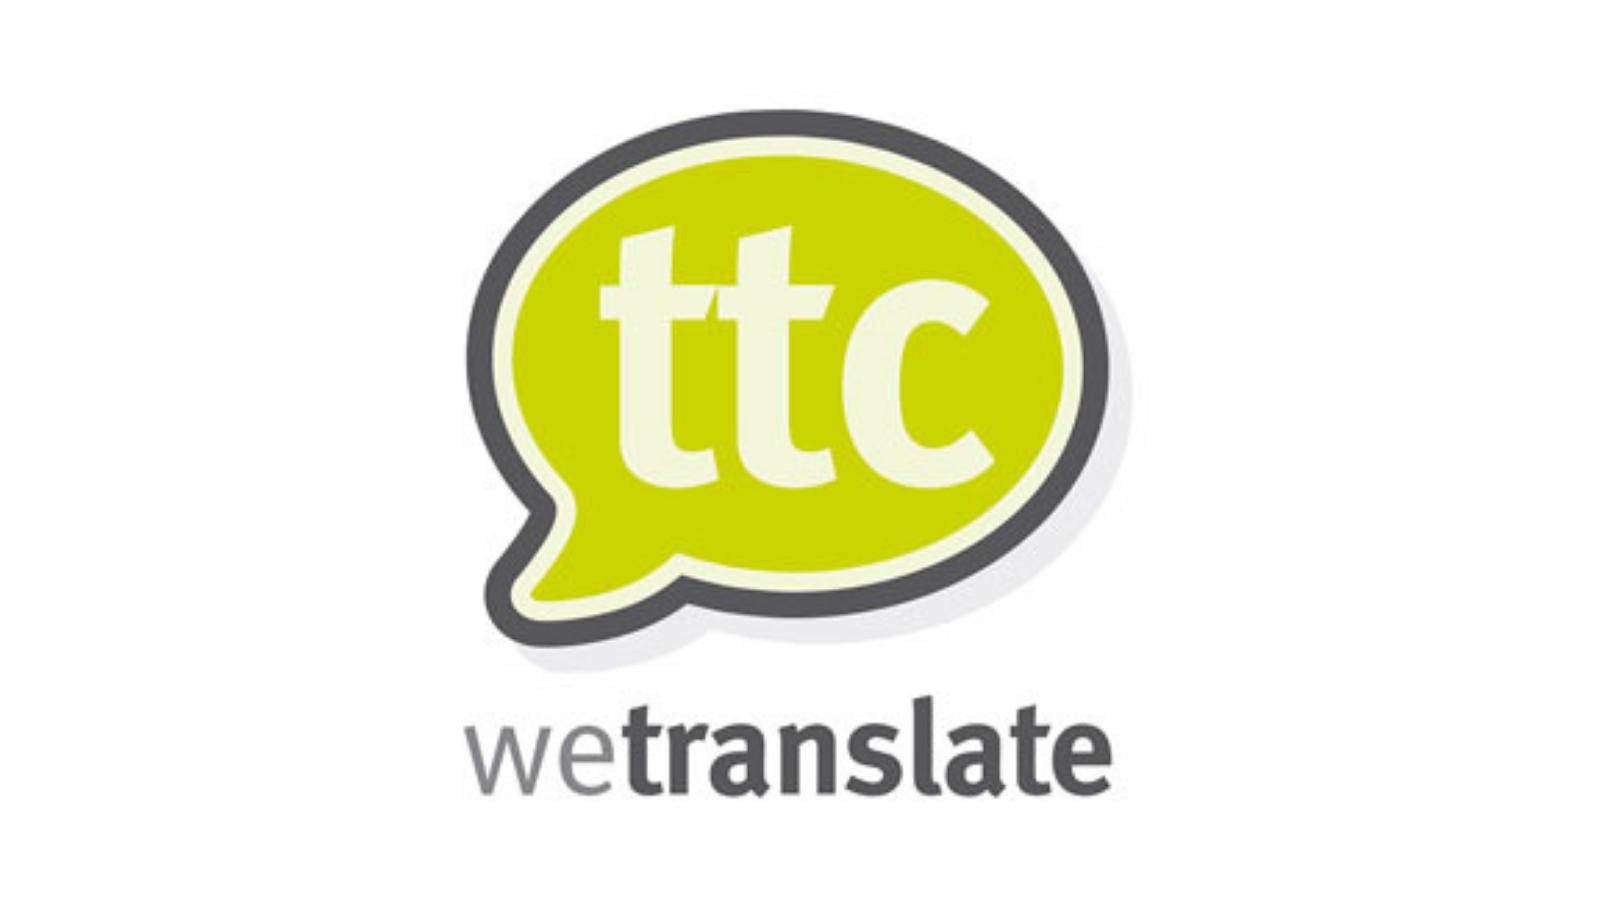 TTC WeTranslate